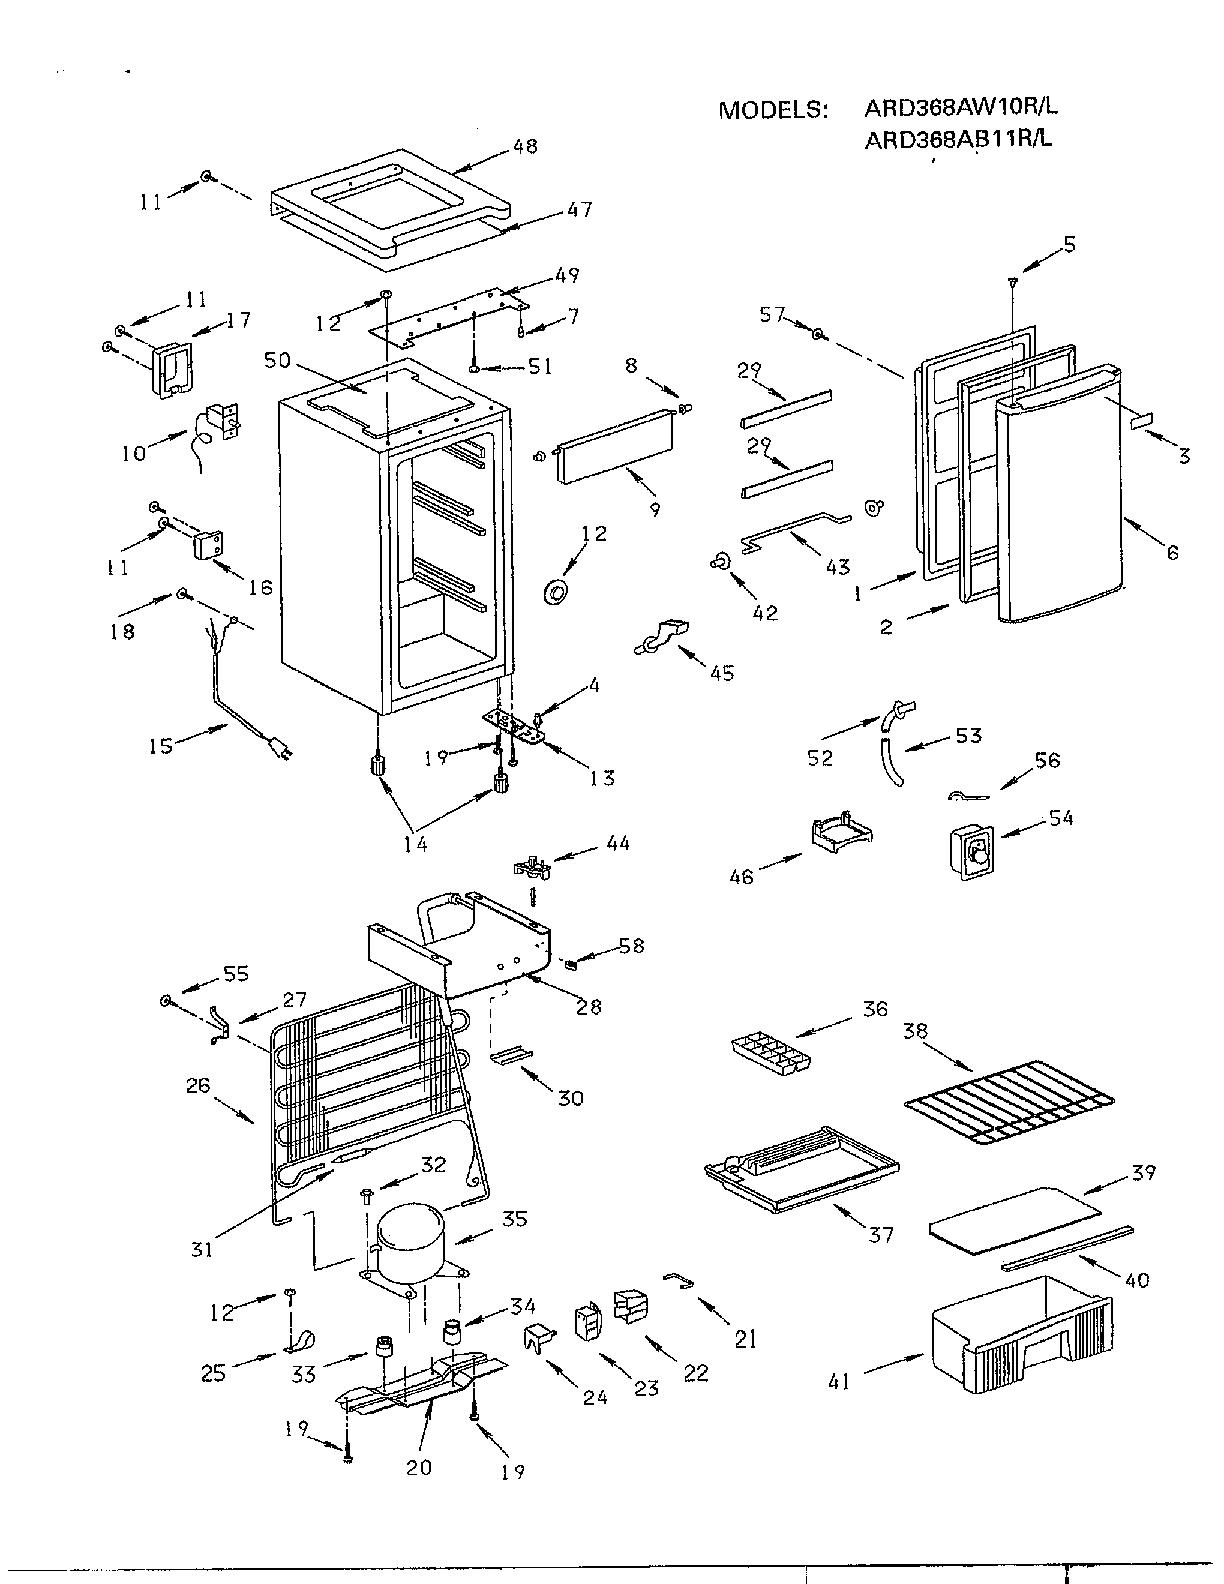 Sanyo model ARD368MB under counter refrigerator genuine parts